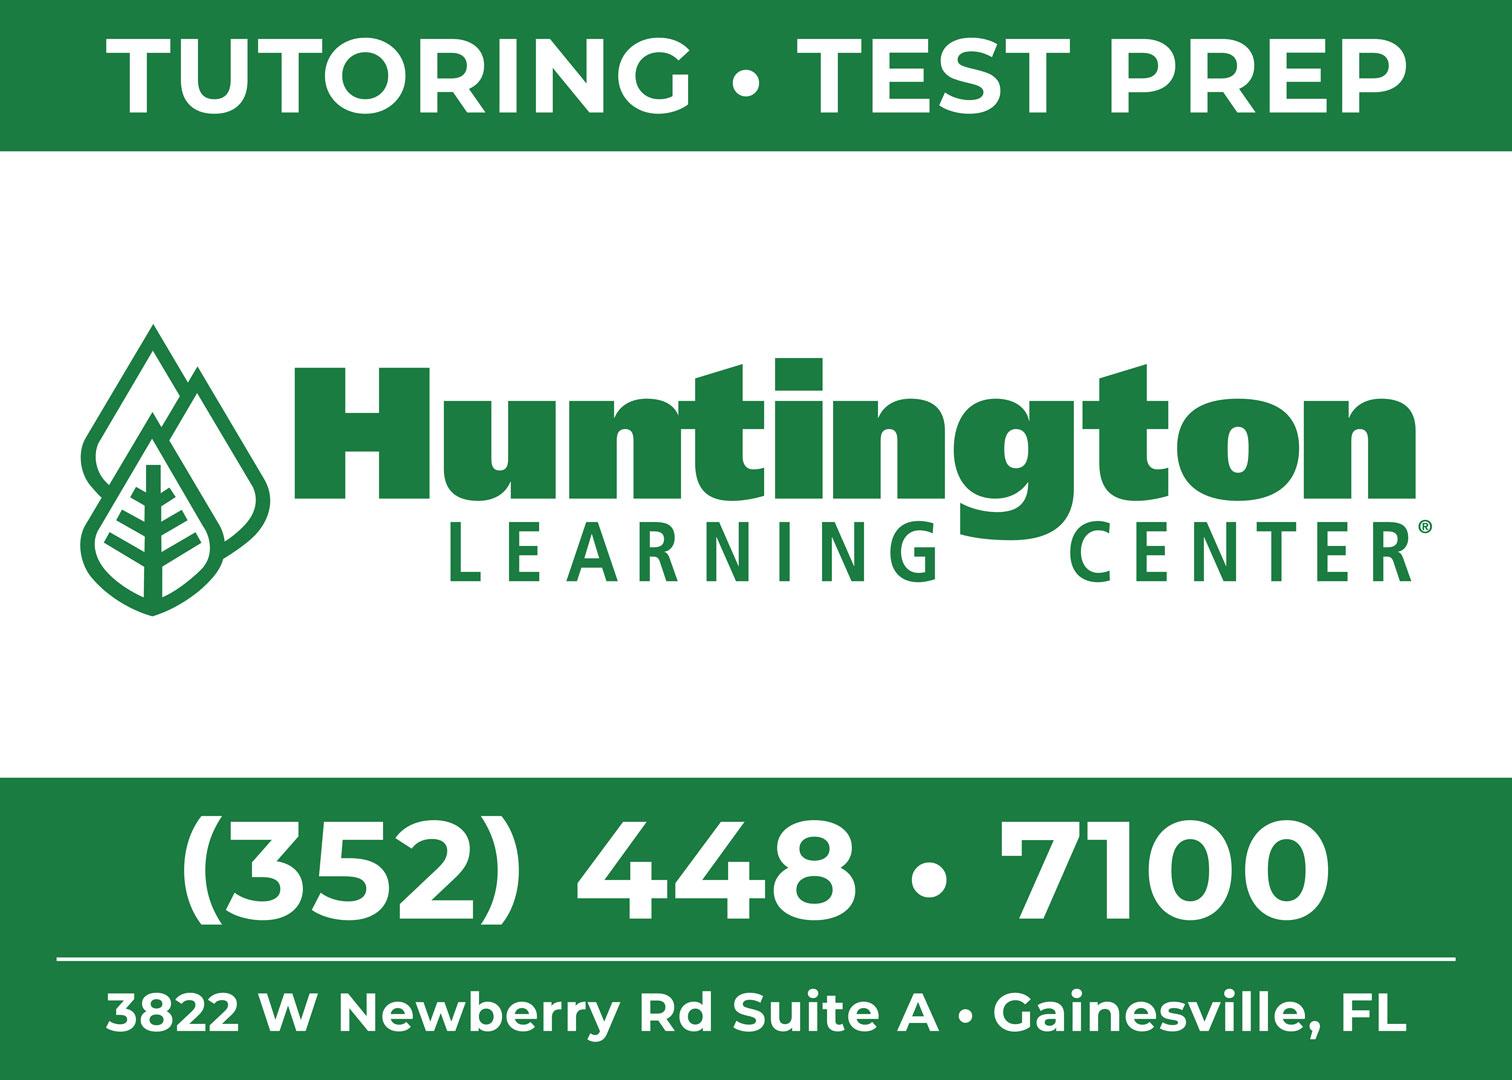 Huntington Learning